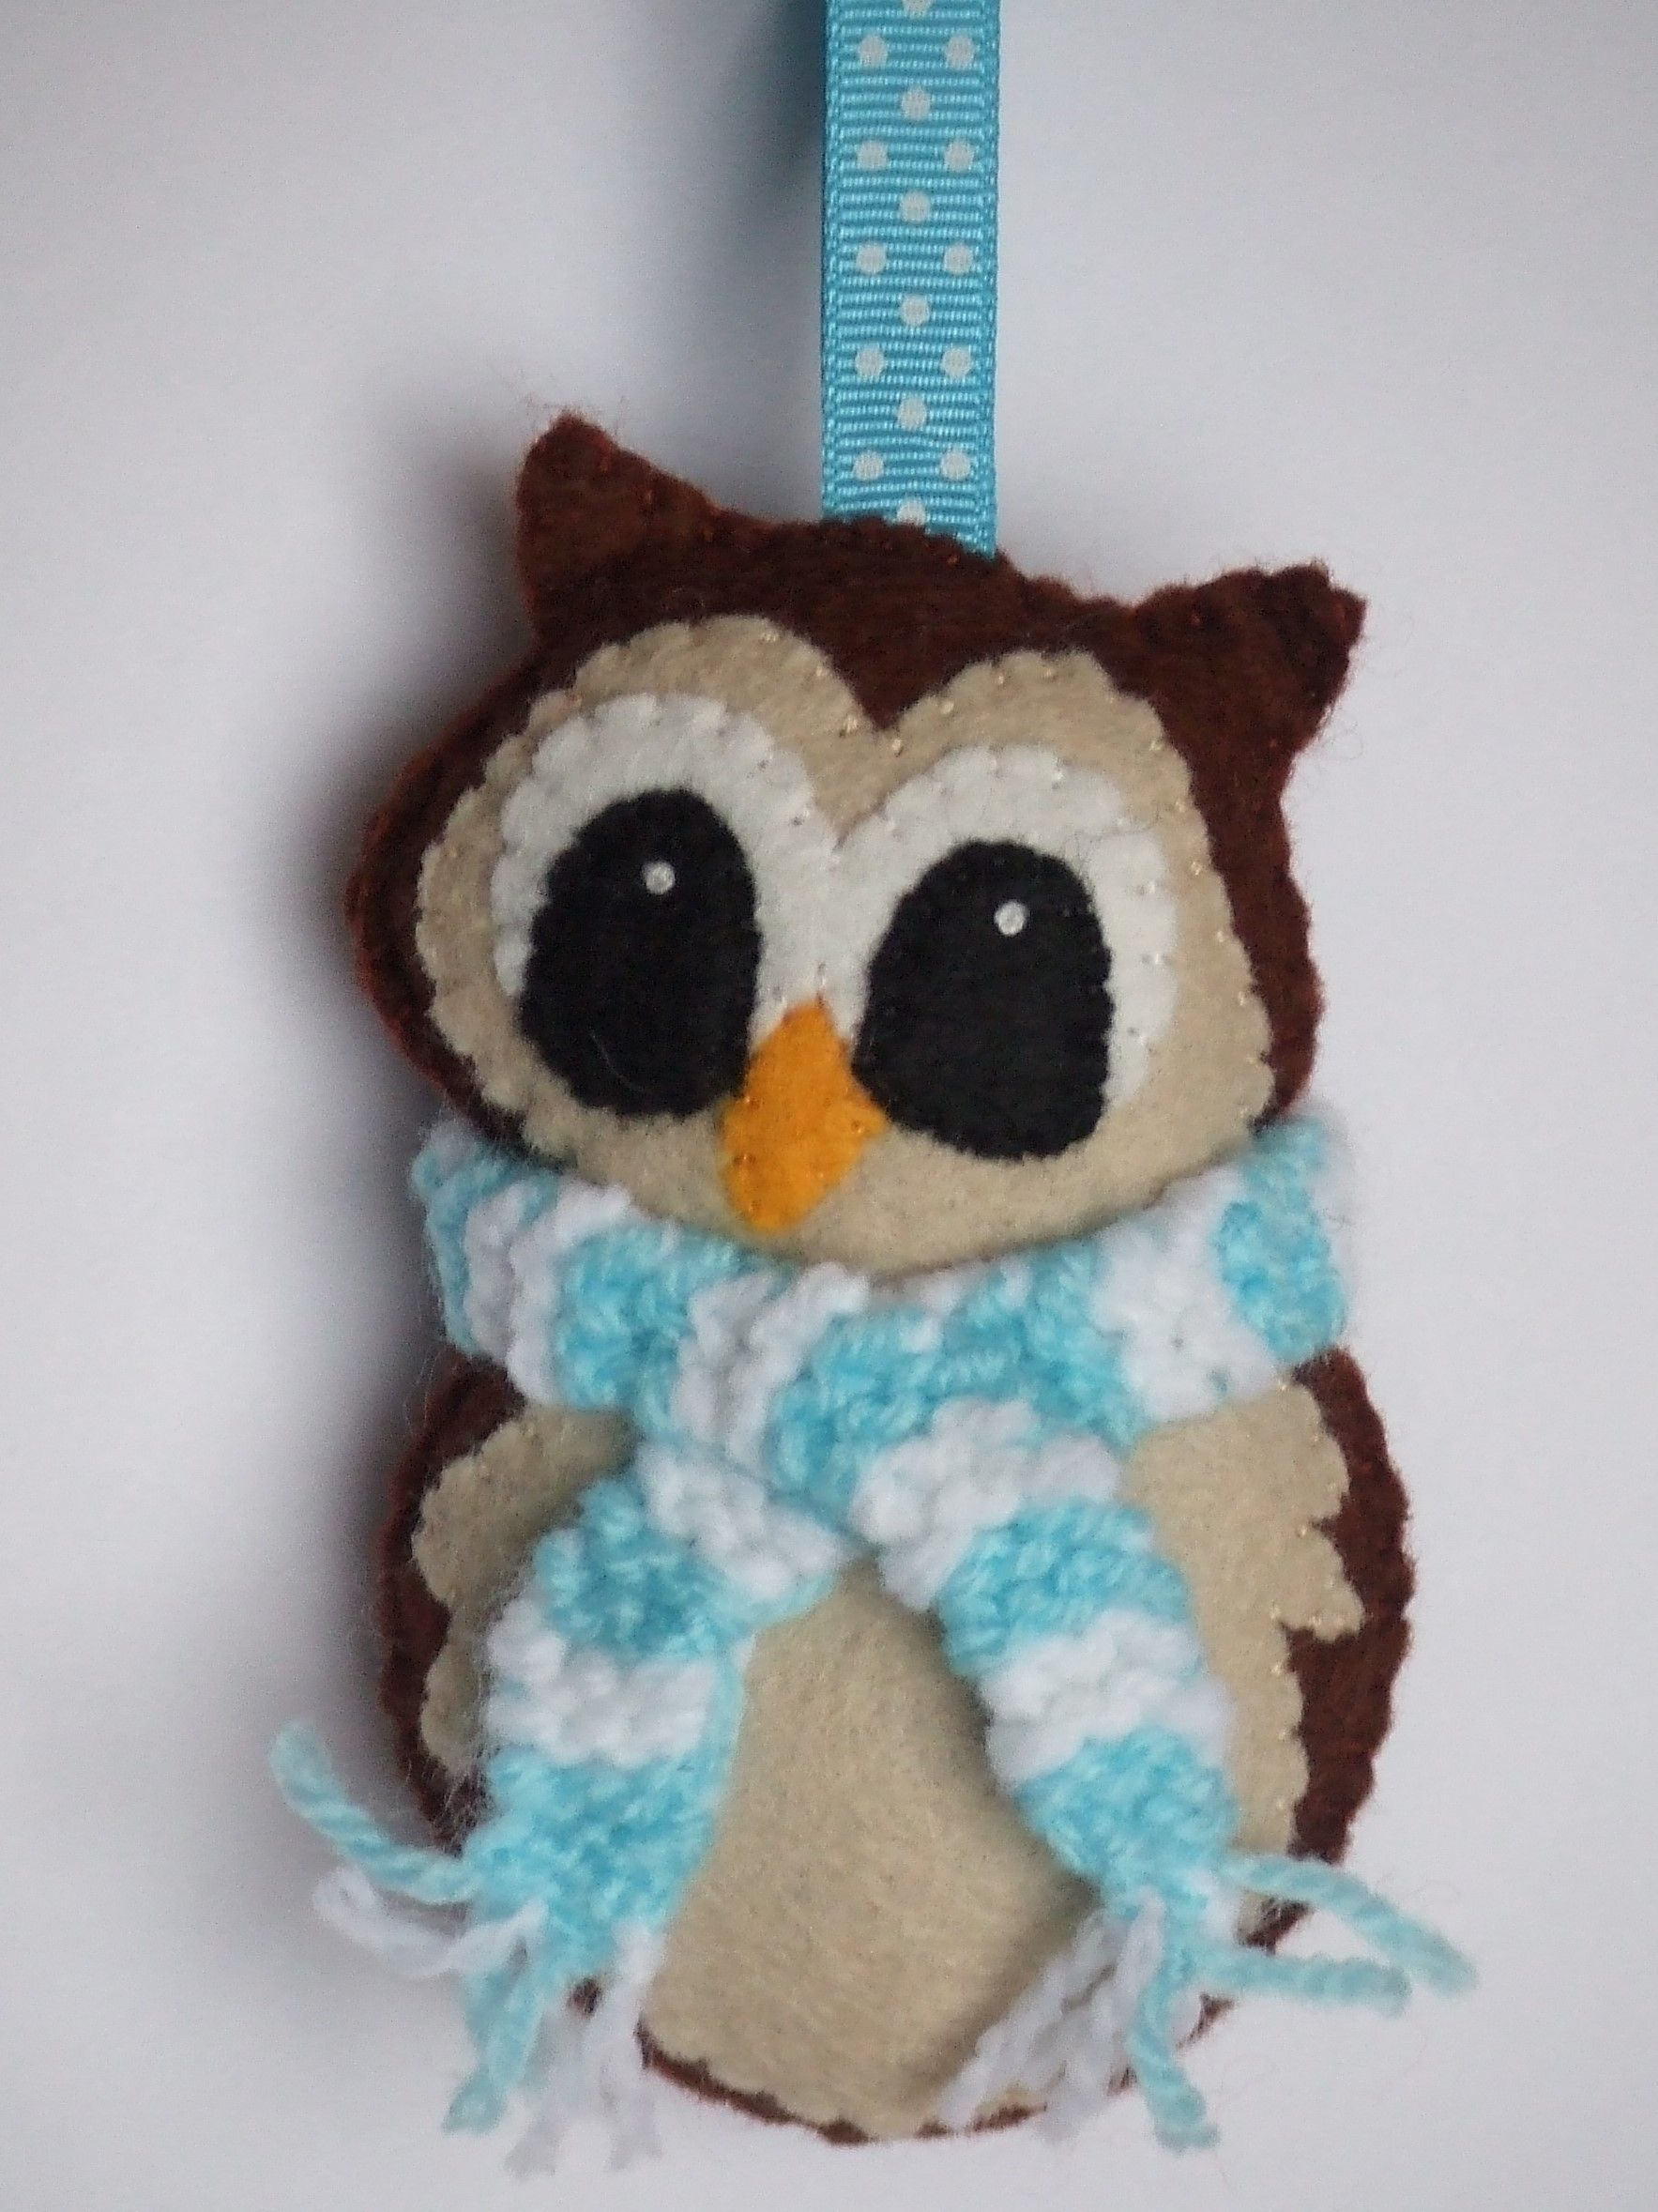 Felt Owl Christmas Decoration Wwwfacebookcomthecraftyweehenscouk